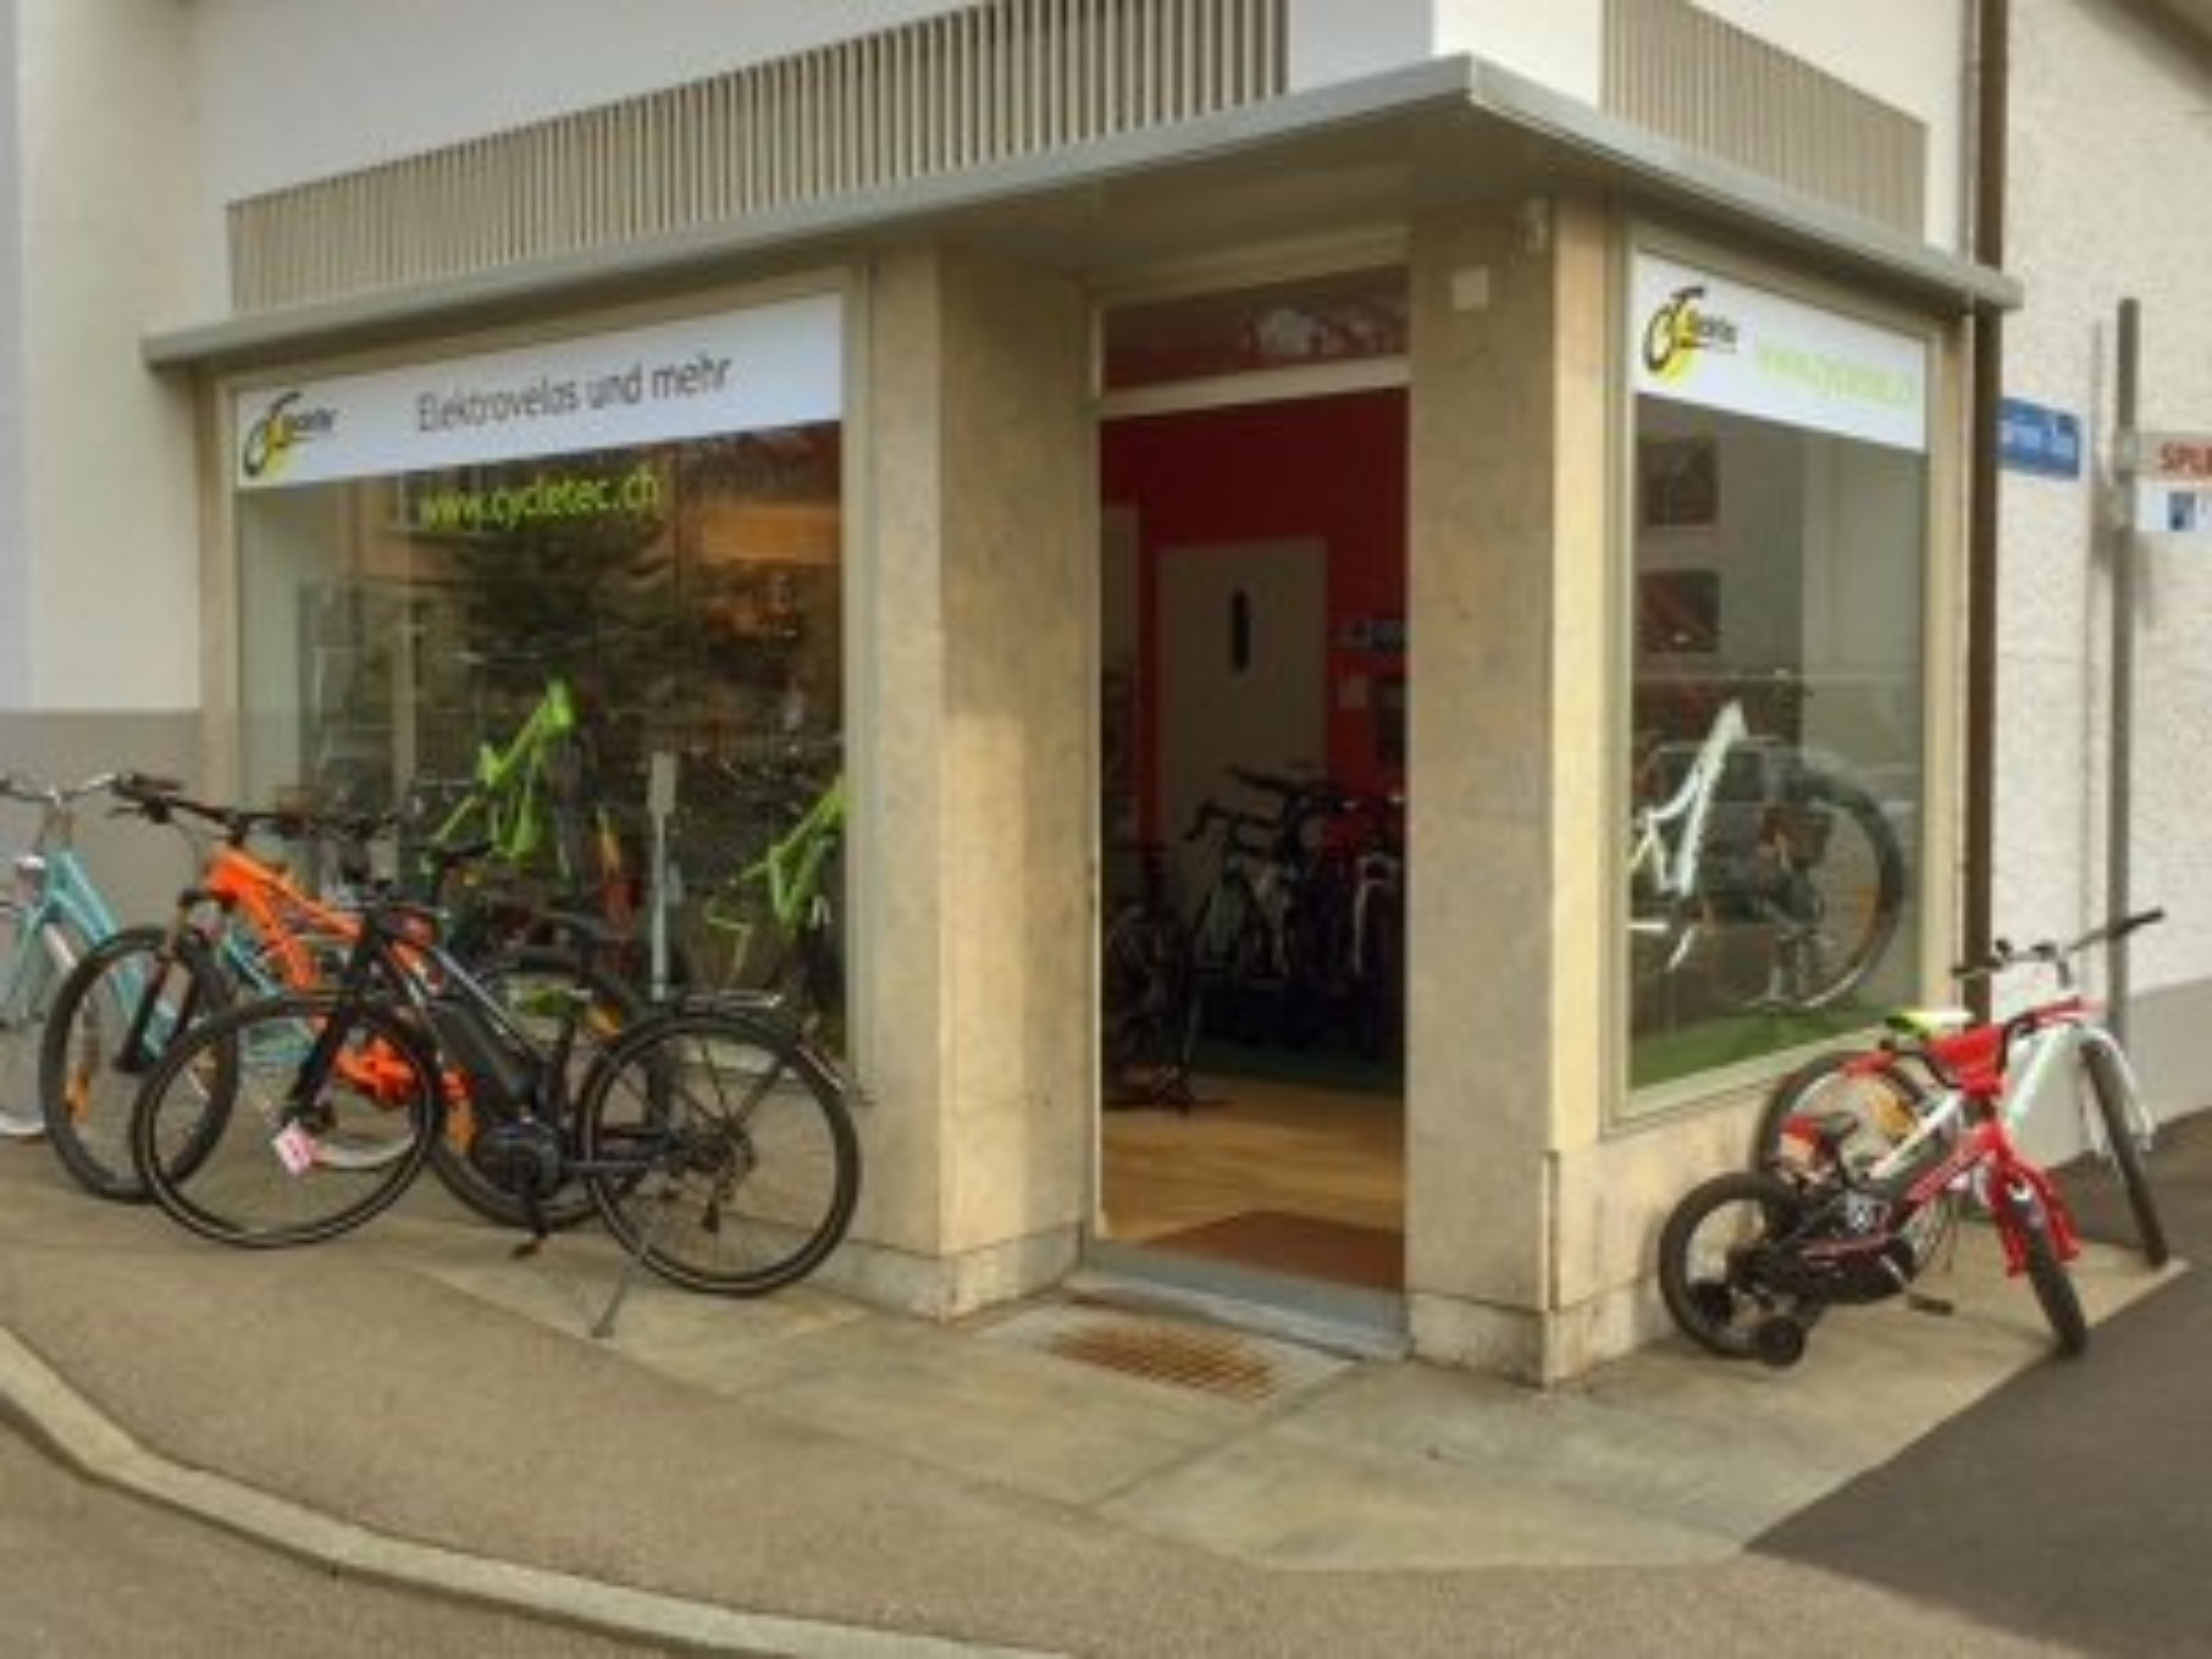 CycleTec GmbH